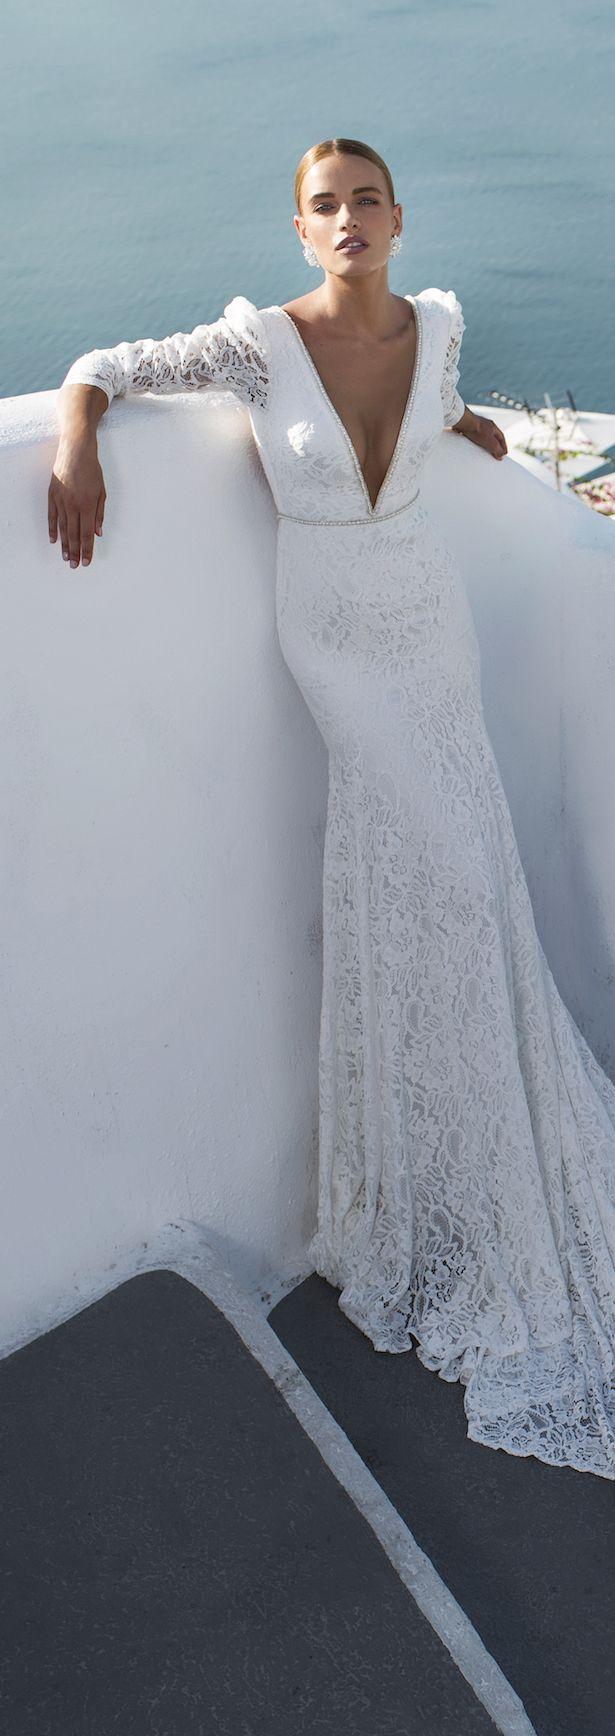 35 best Wedding Dress images on Pinterest | Gown wedding, Wedding ...